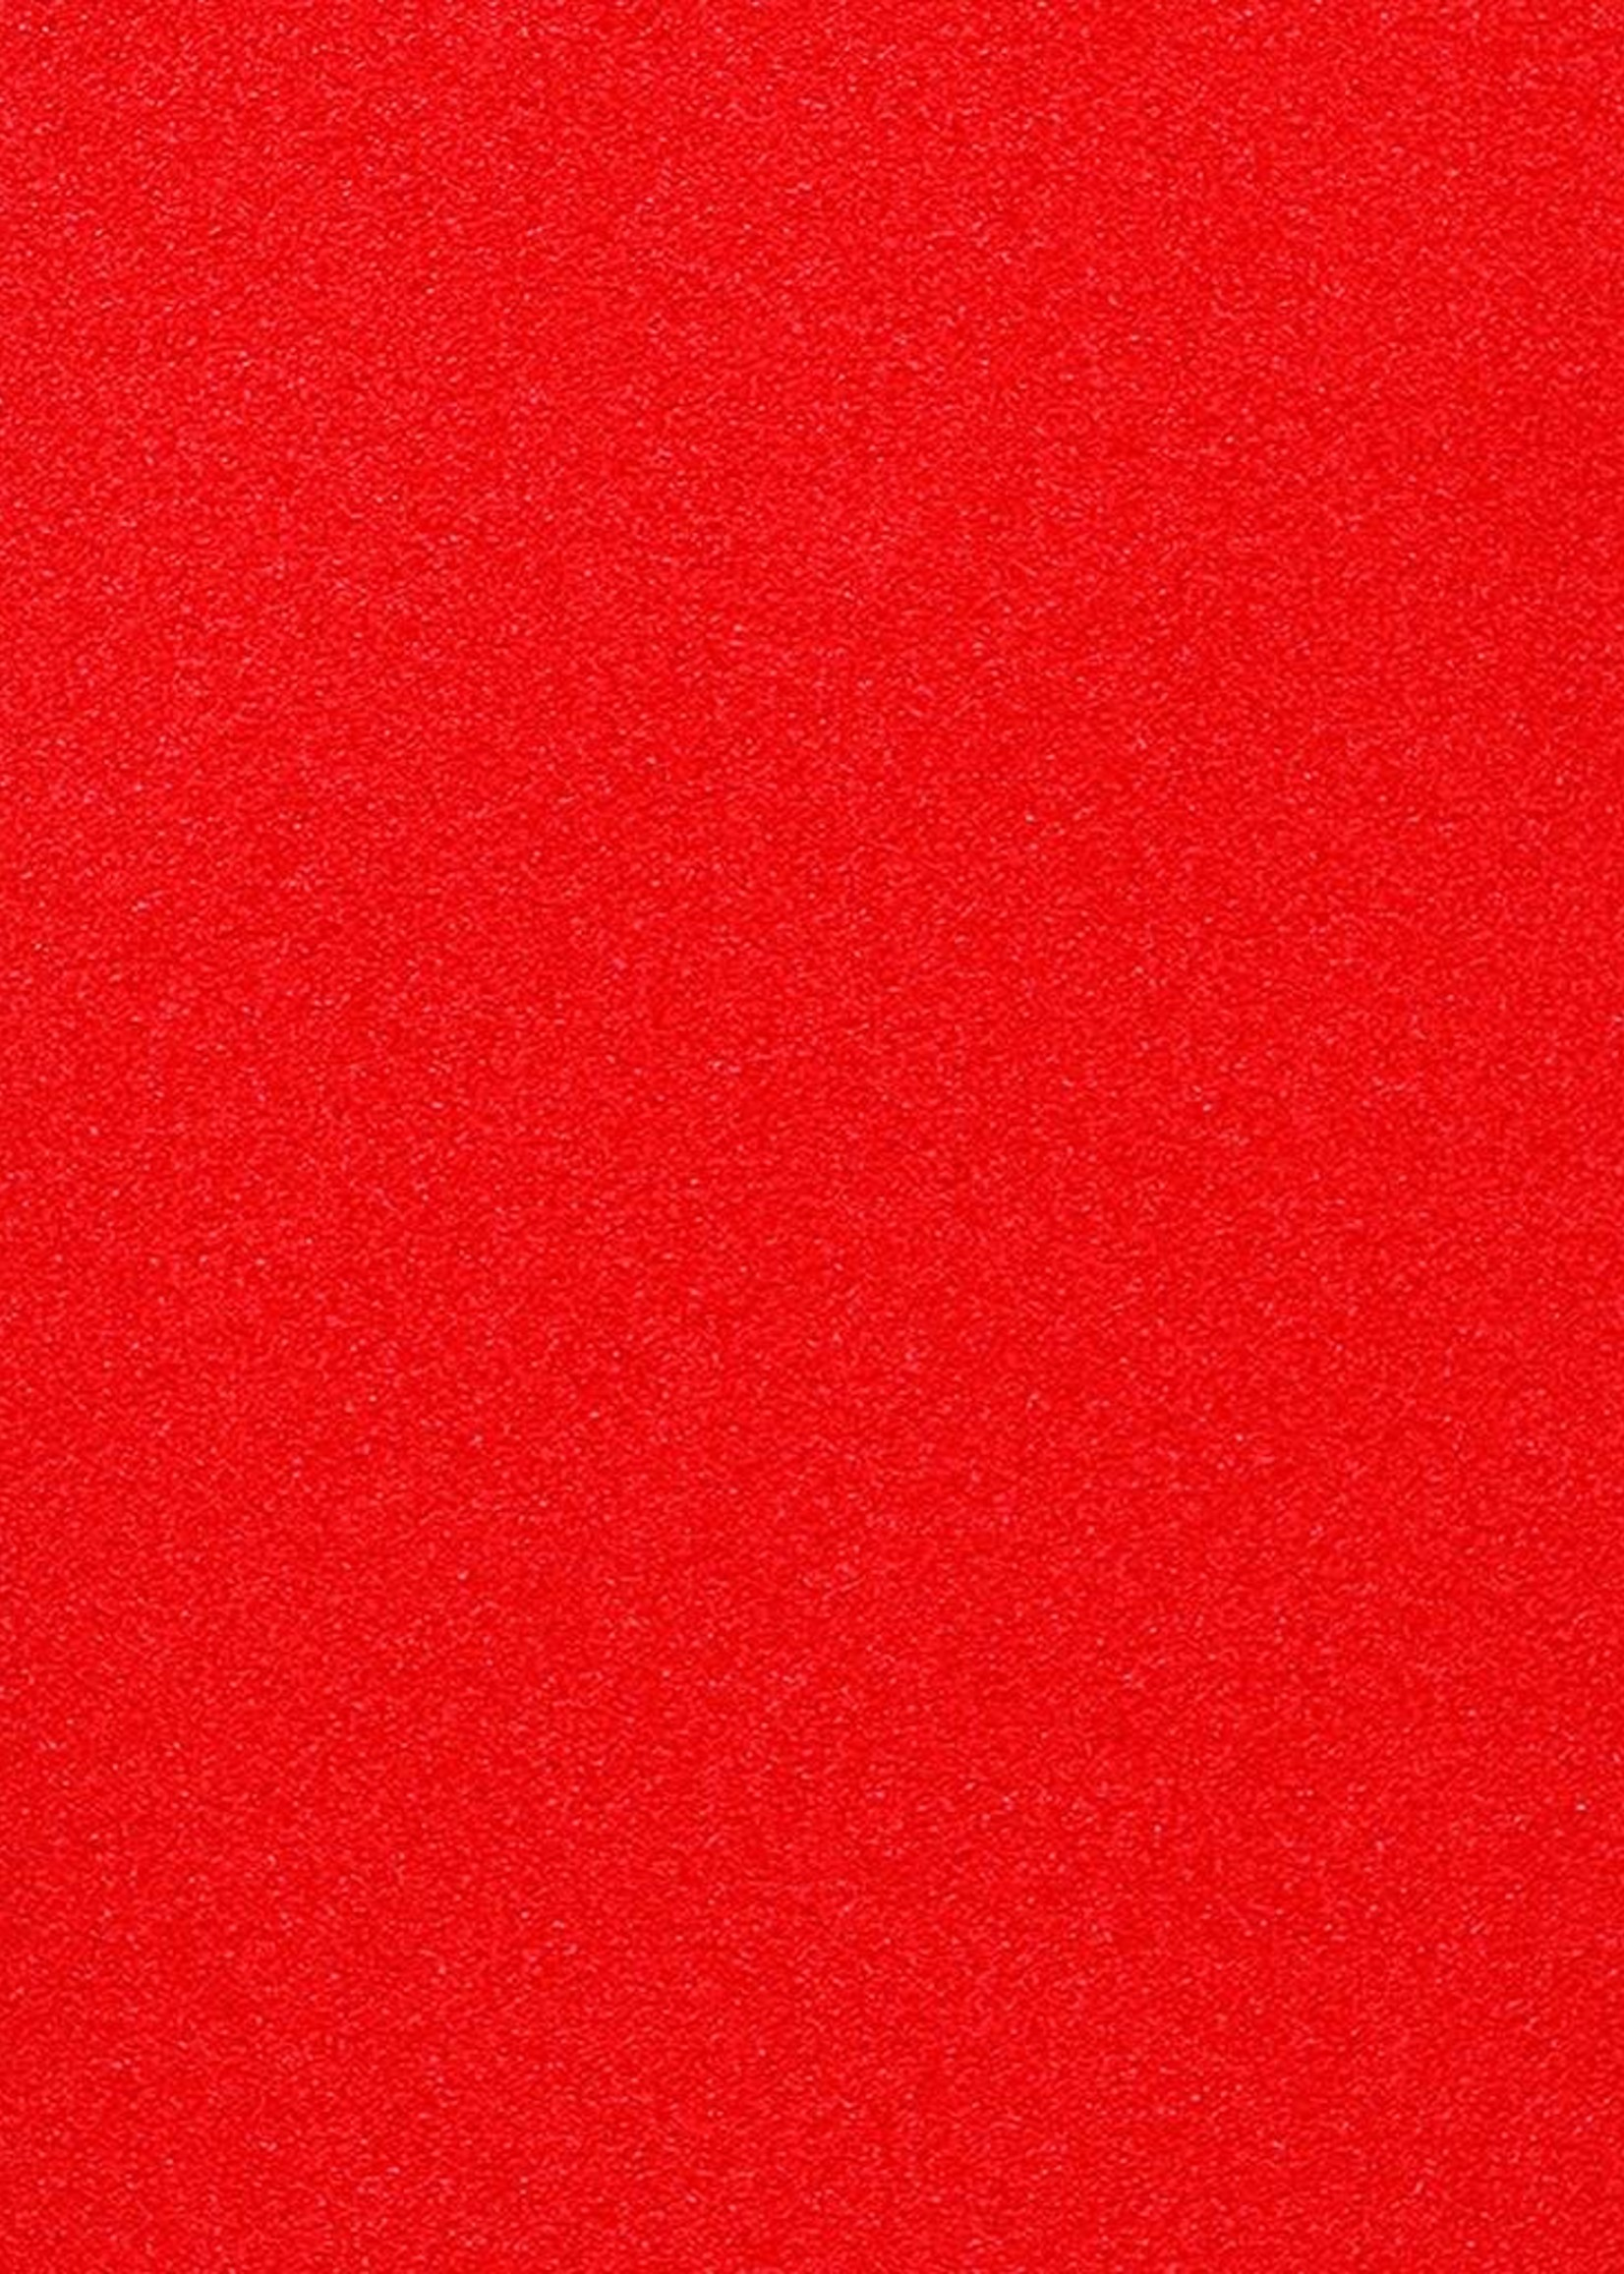 "Vision Street Wear Vision Color Griptape Sheet 9"" x 33"" Red"